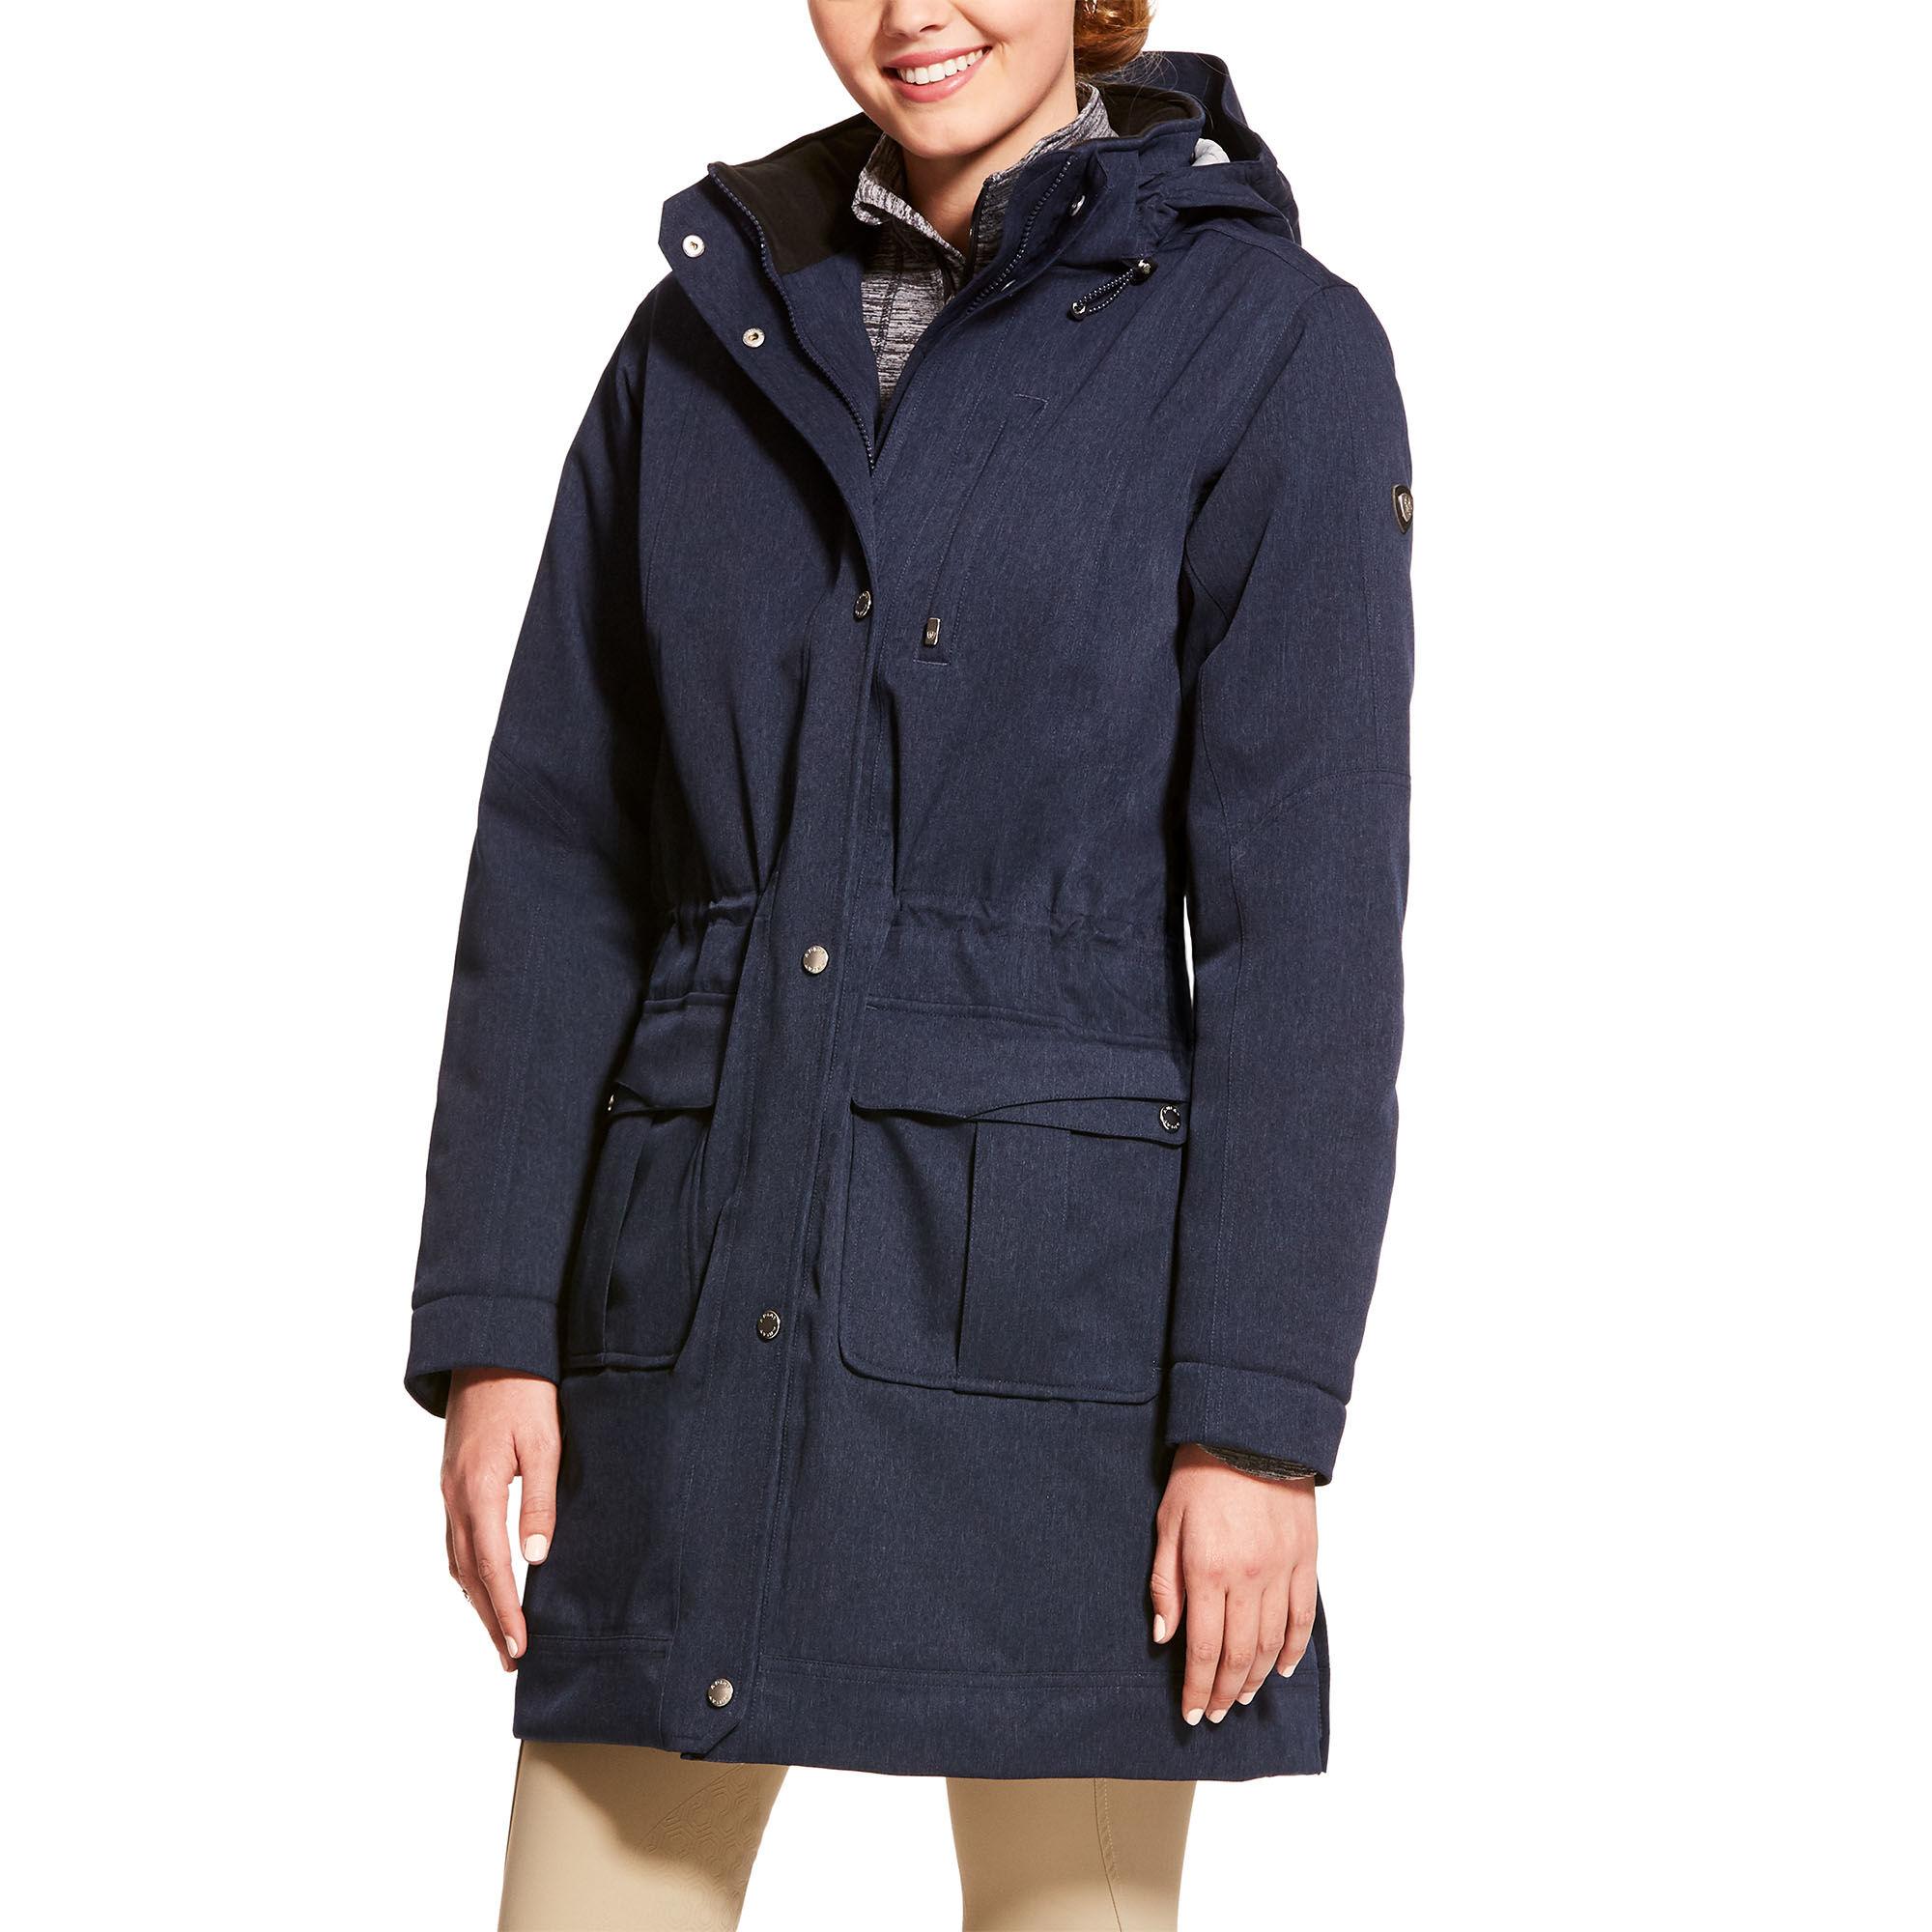 Ariat Madden Waterproof Parka Coat Navy